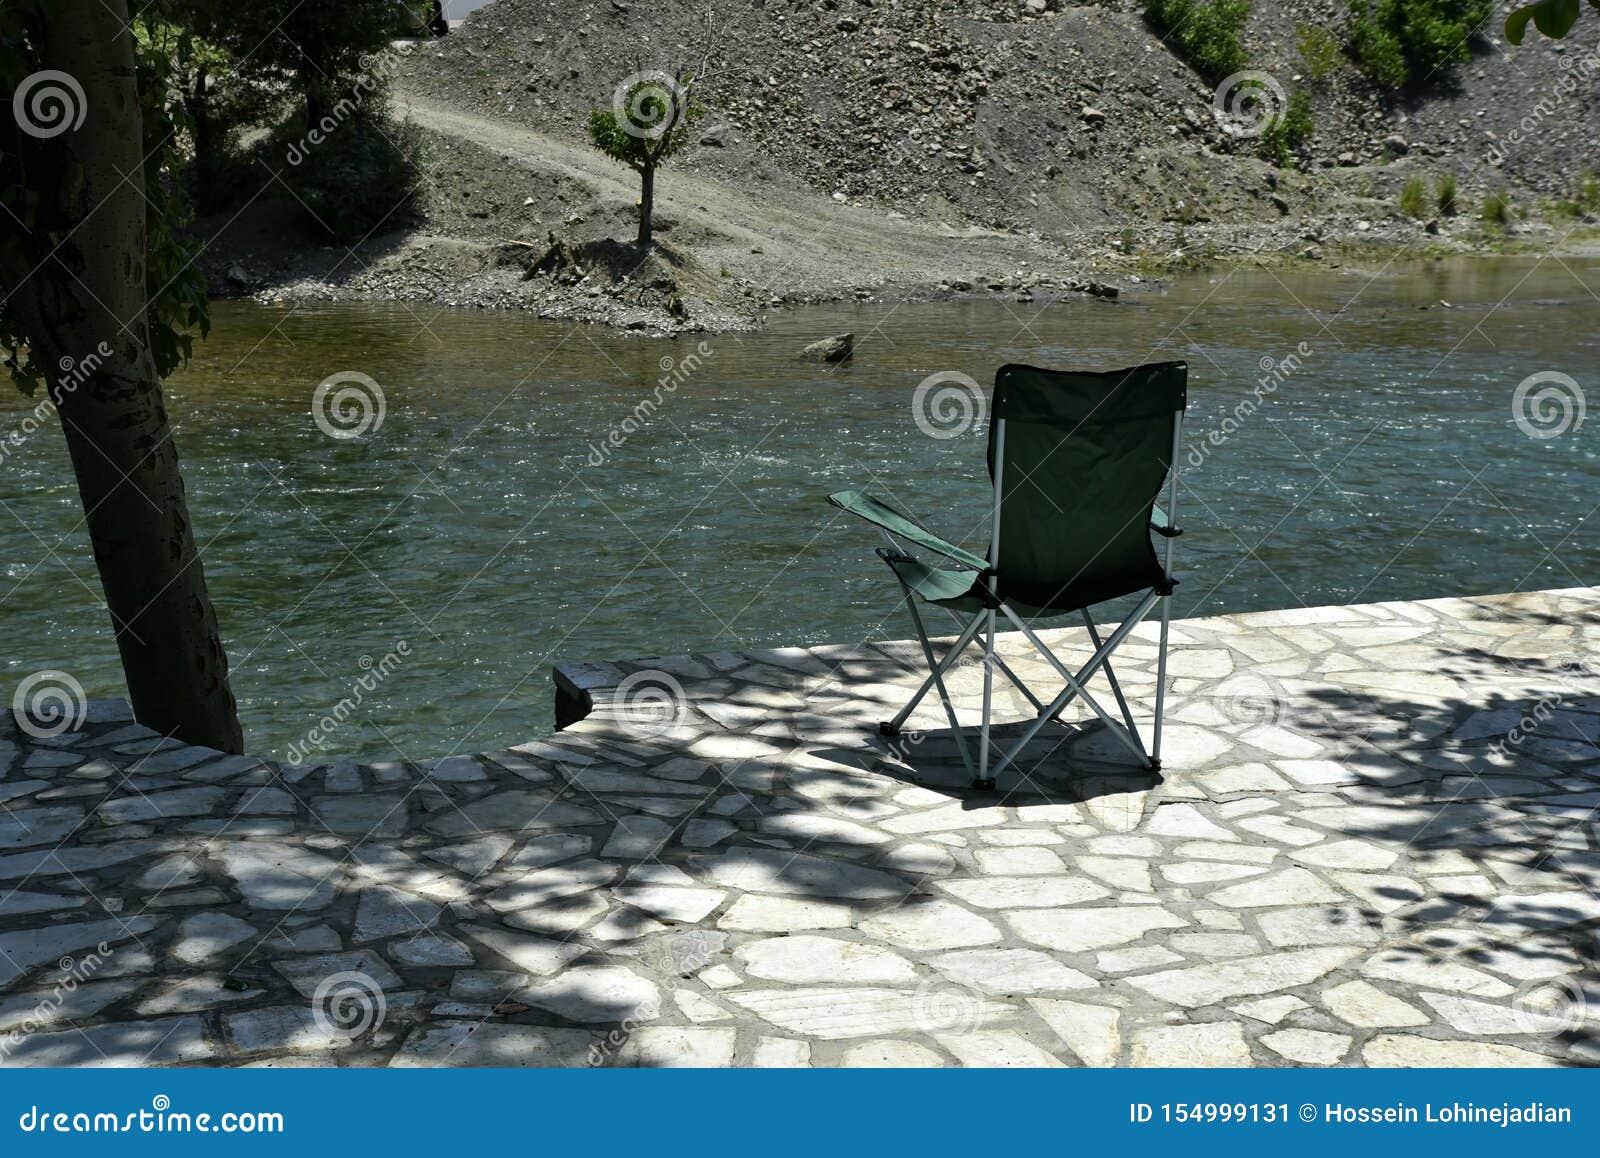 Safari Chair com a ideia do rood Zayanderud de Zayandeh, Esfahan, Irã no dia